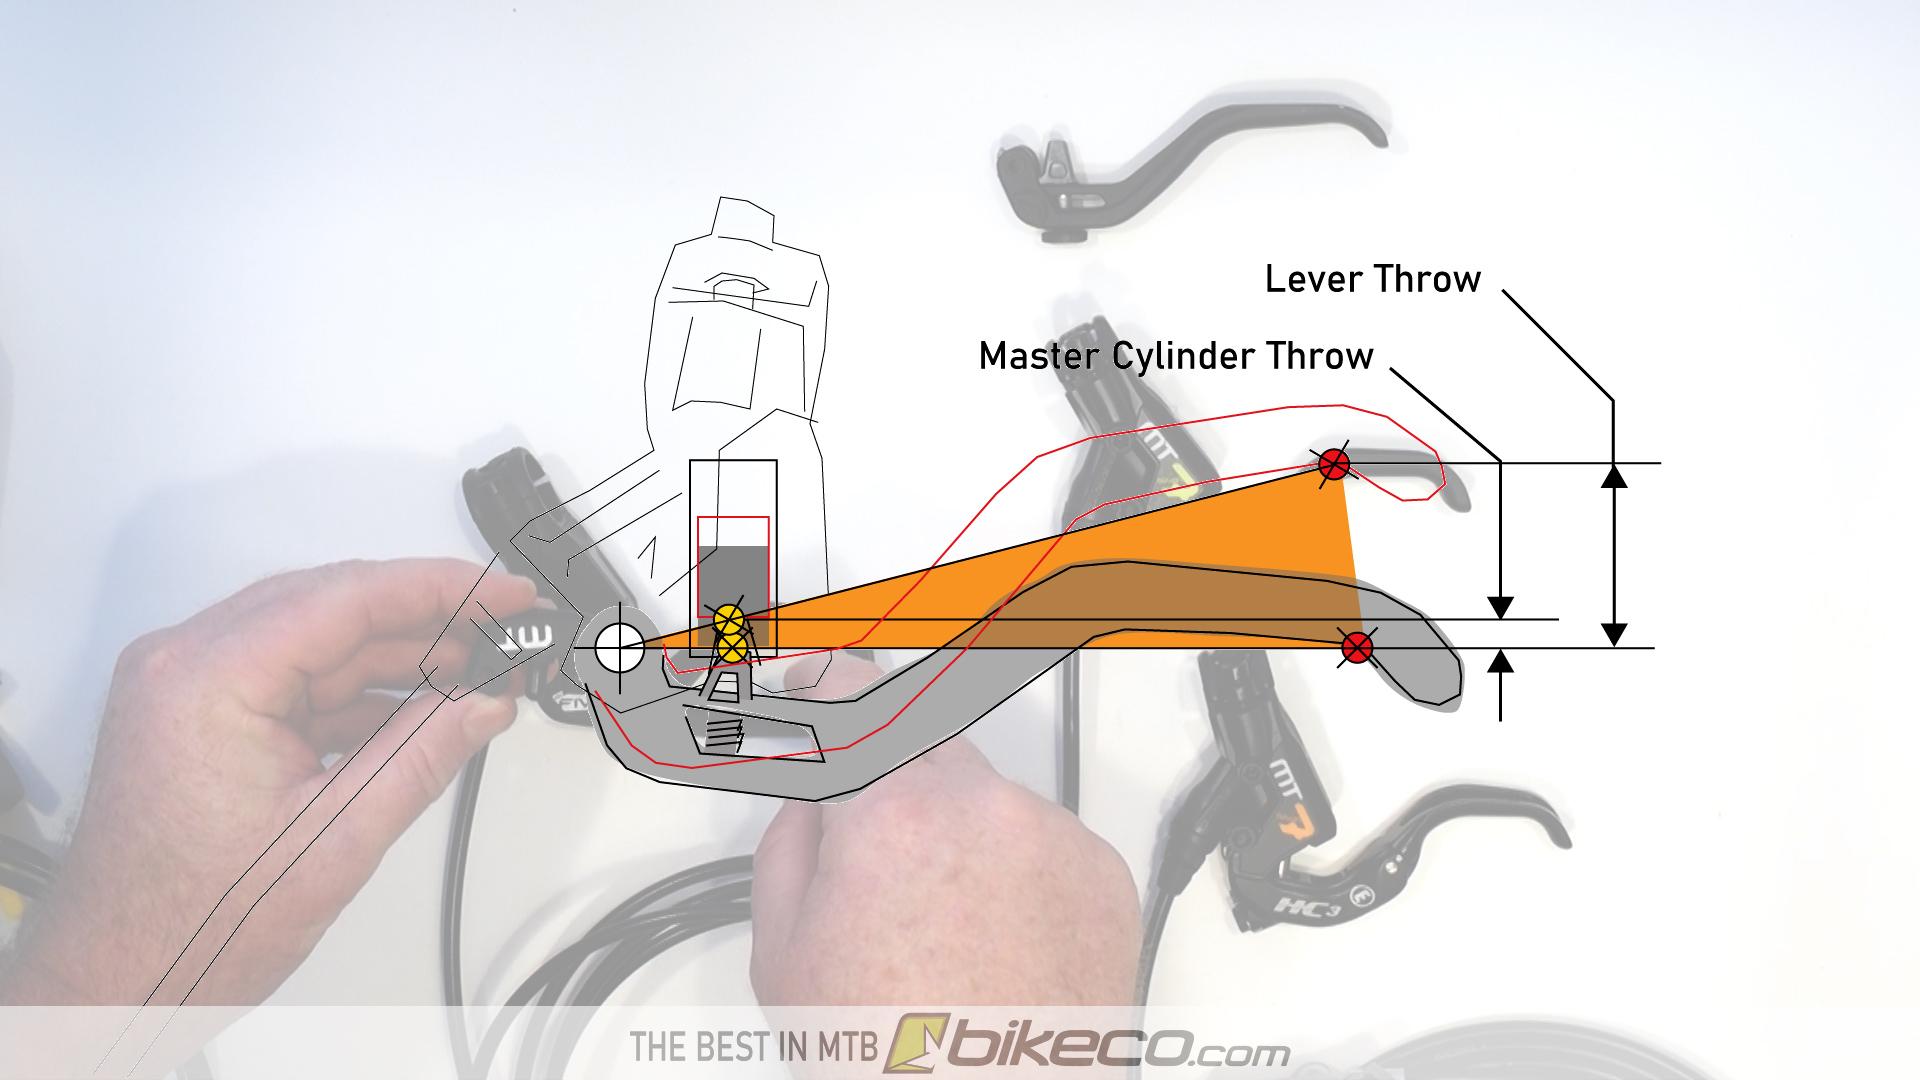 Magura Mechanical Modulation showing lever throw